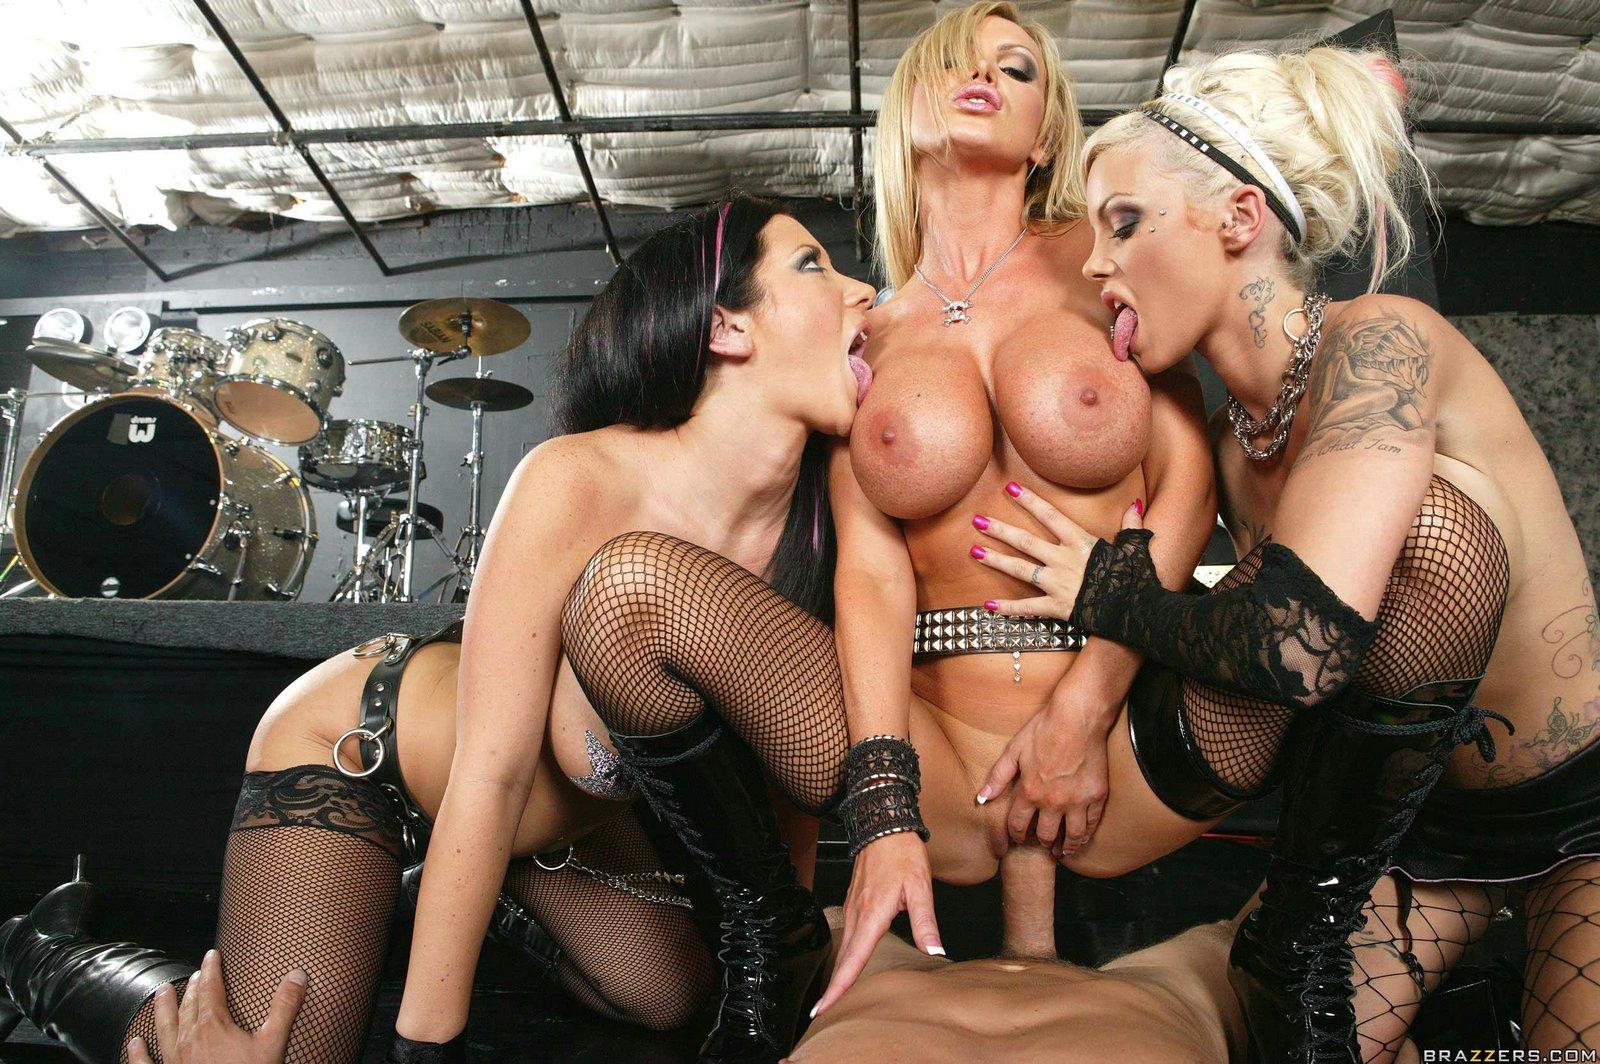 Boob group porn star